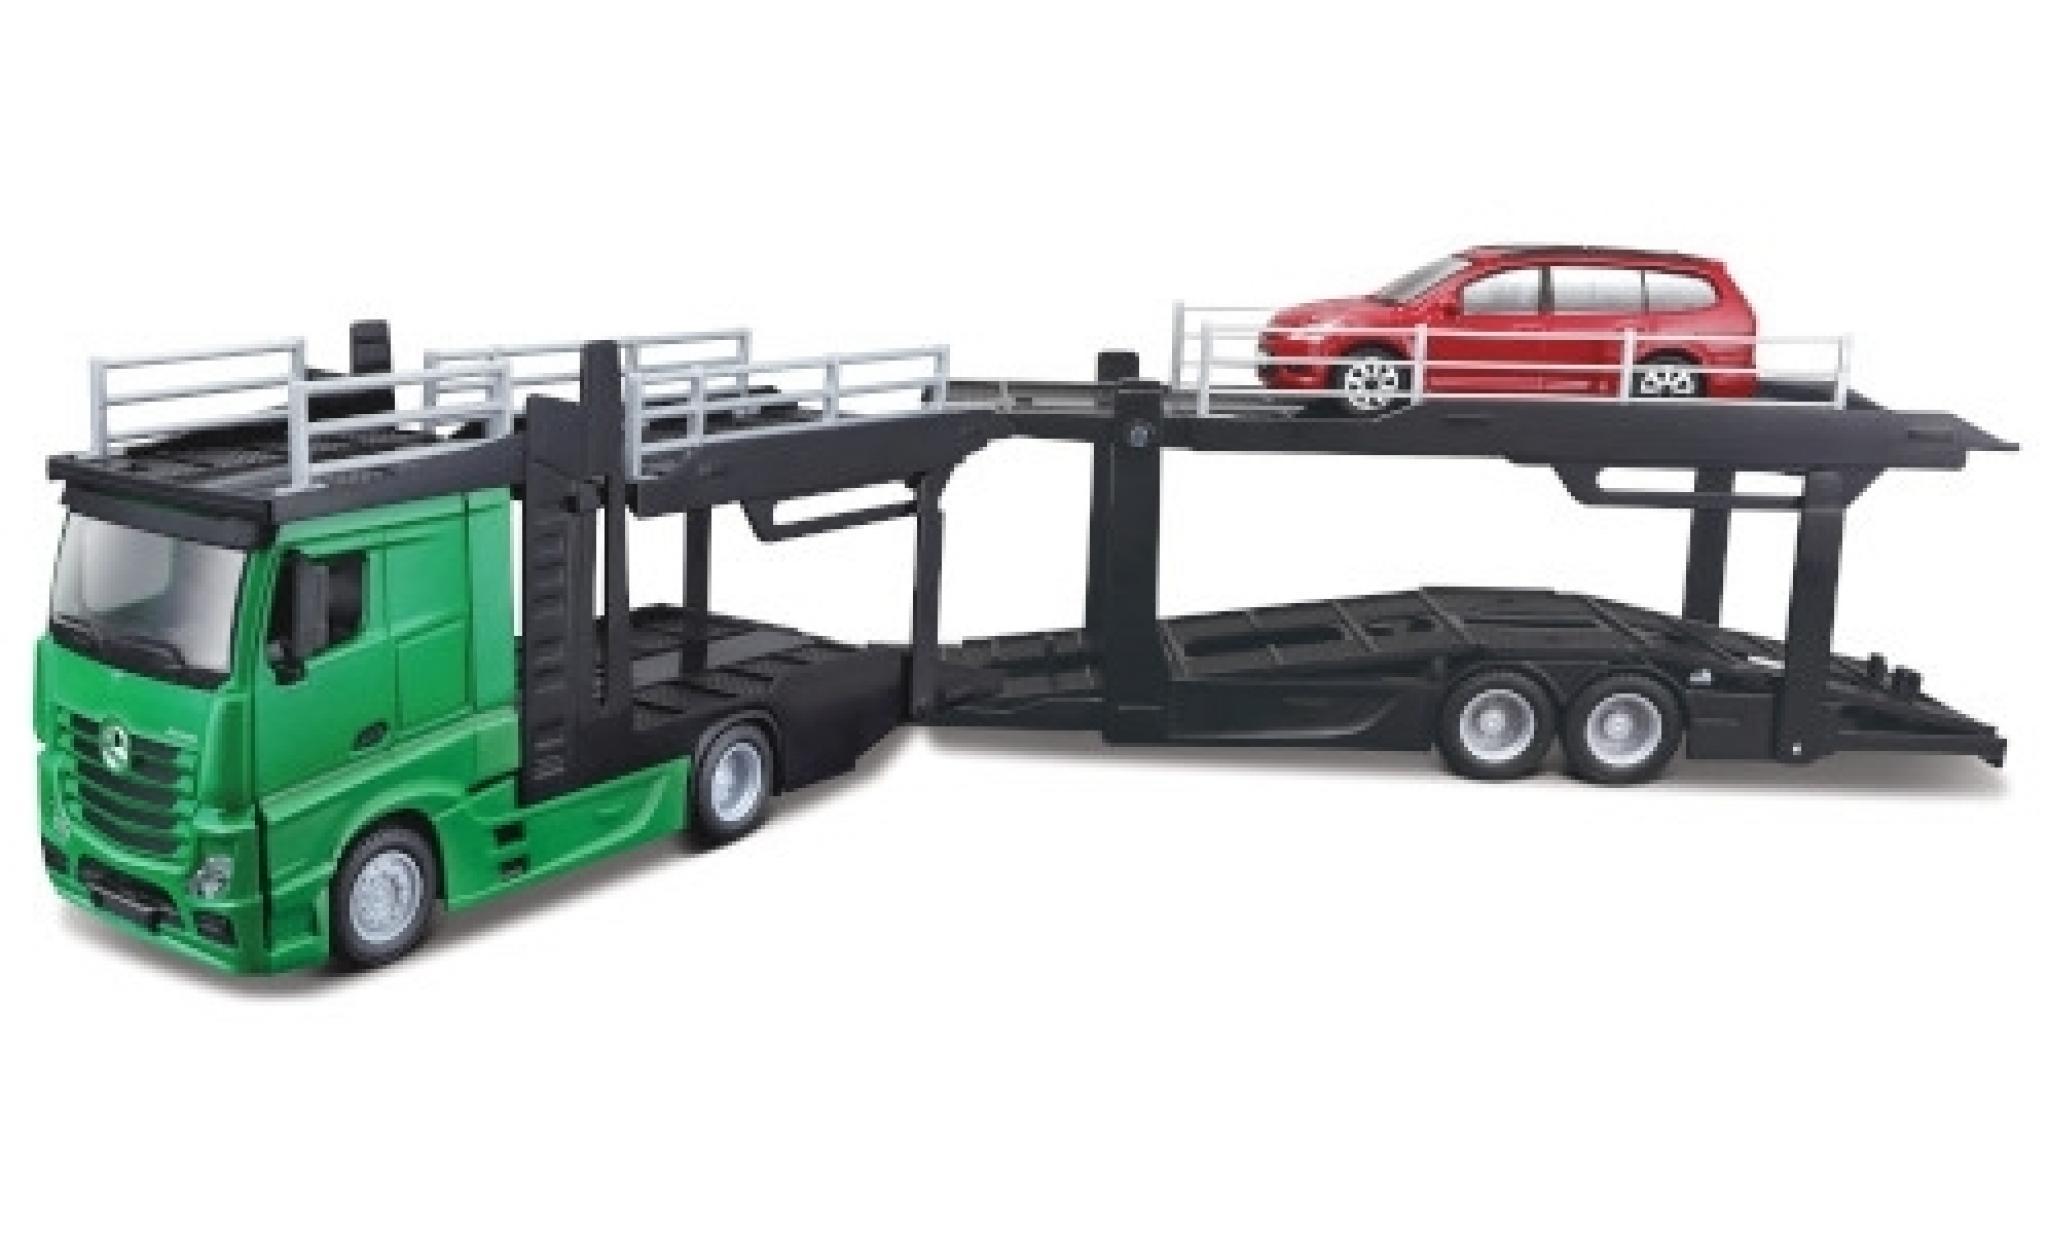 Mercedes Actros 1/43 Bburago 2545 green camion de transport de voiture avec Ford Focus Turnier